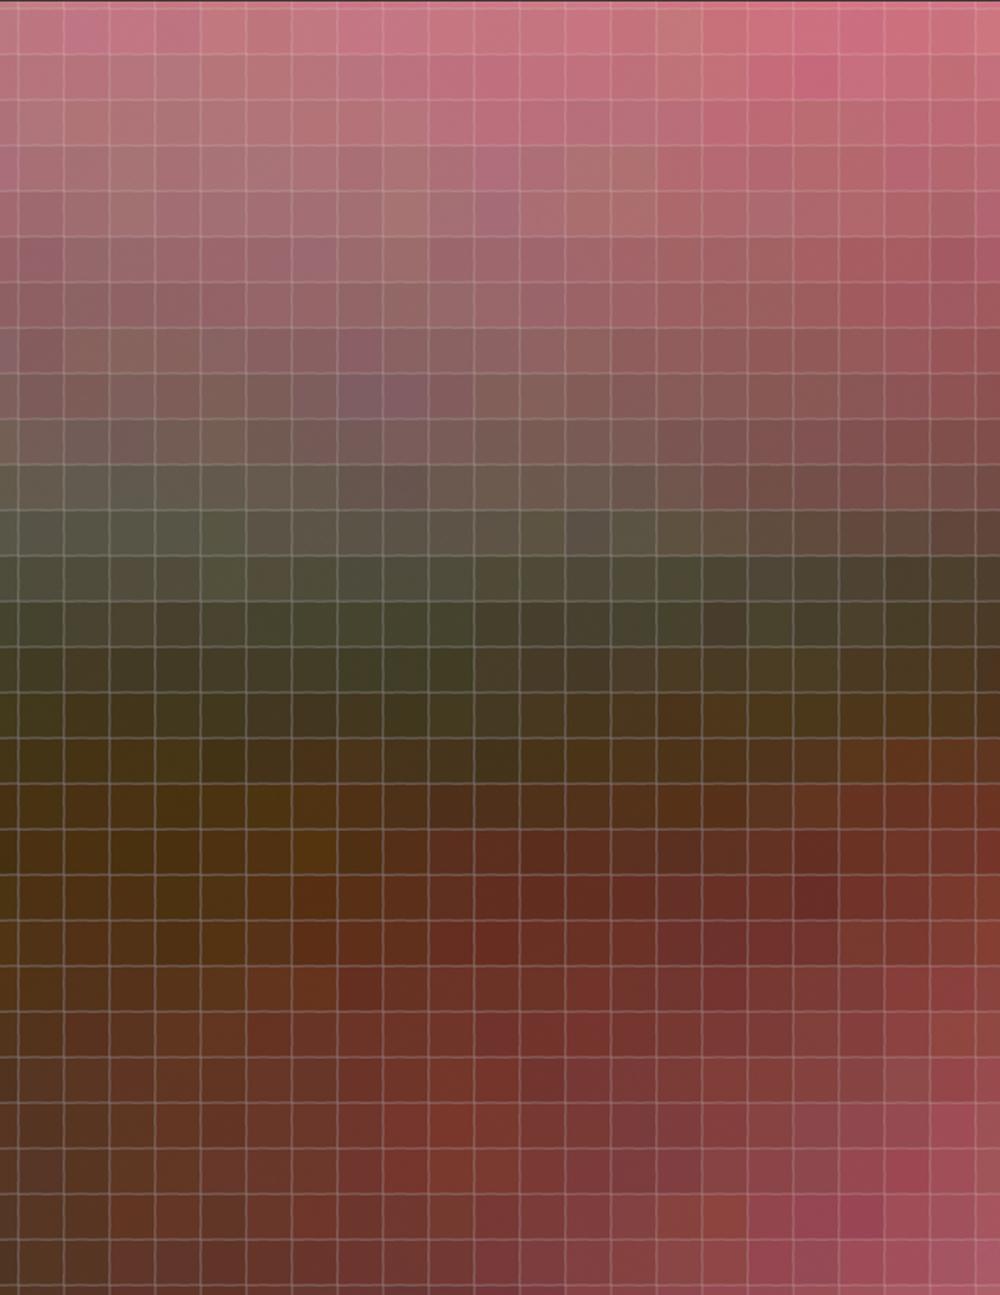 pixel8.jpg